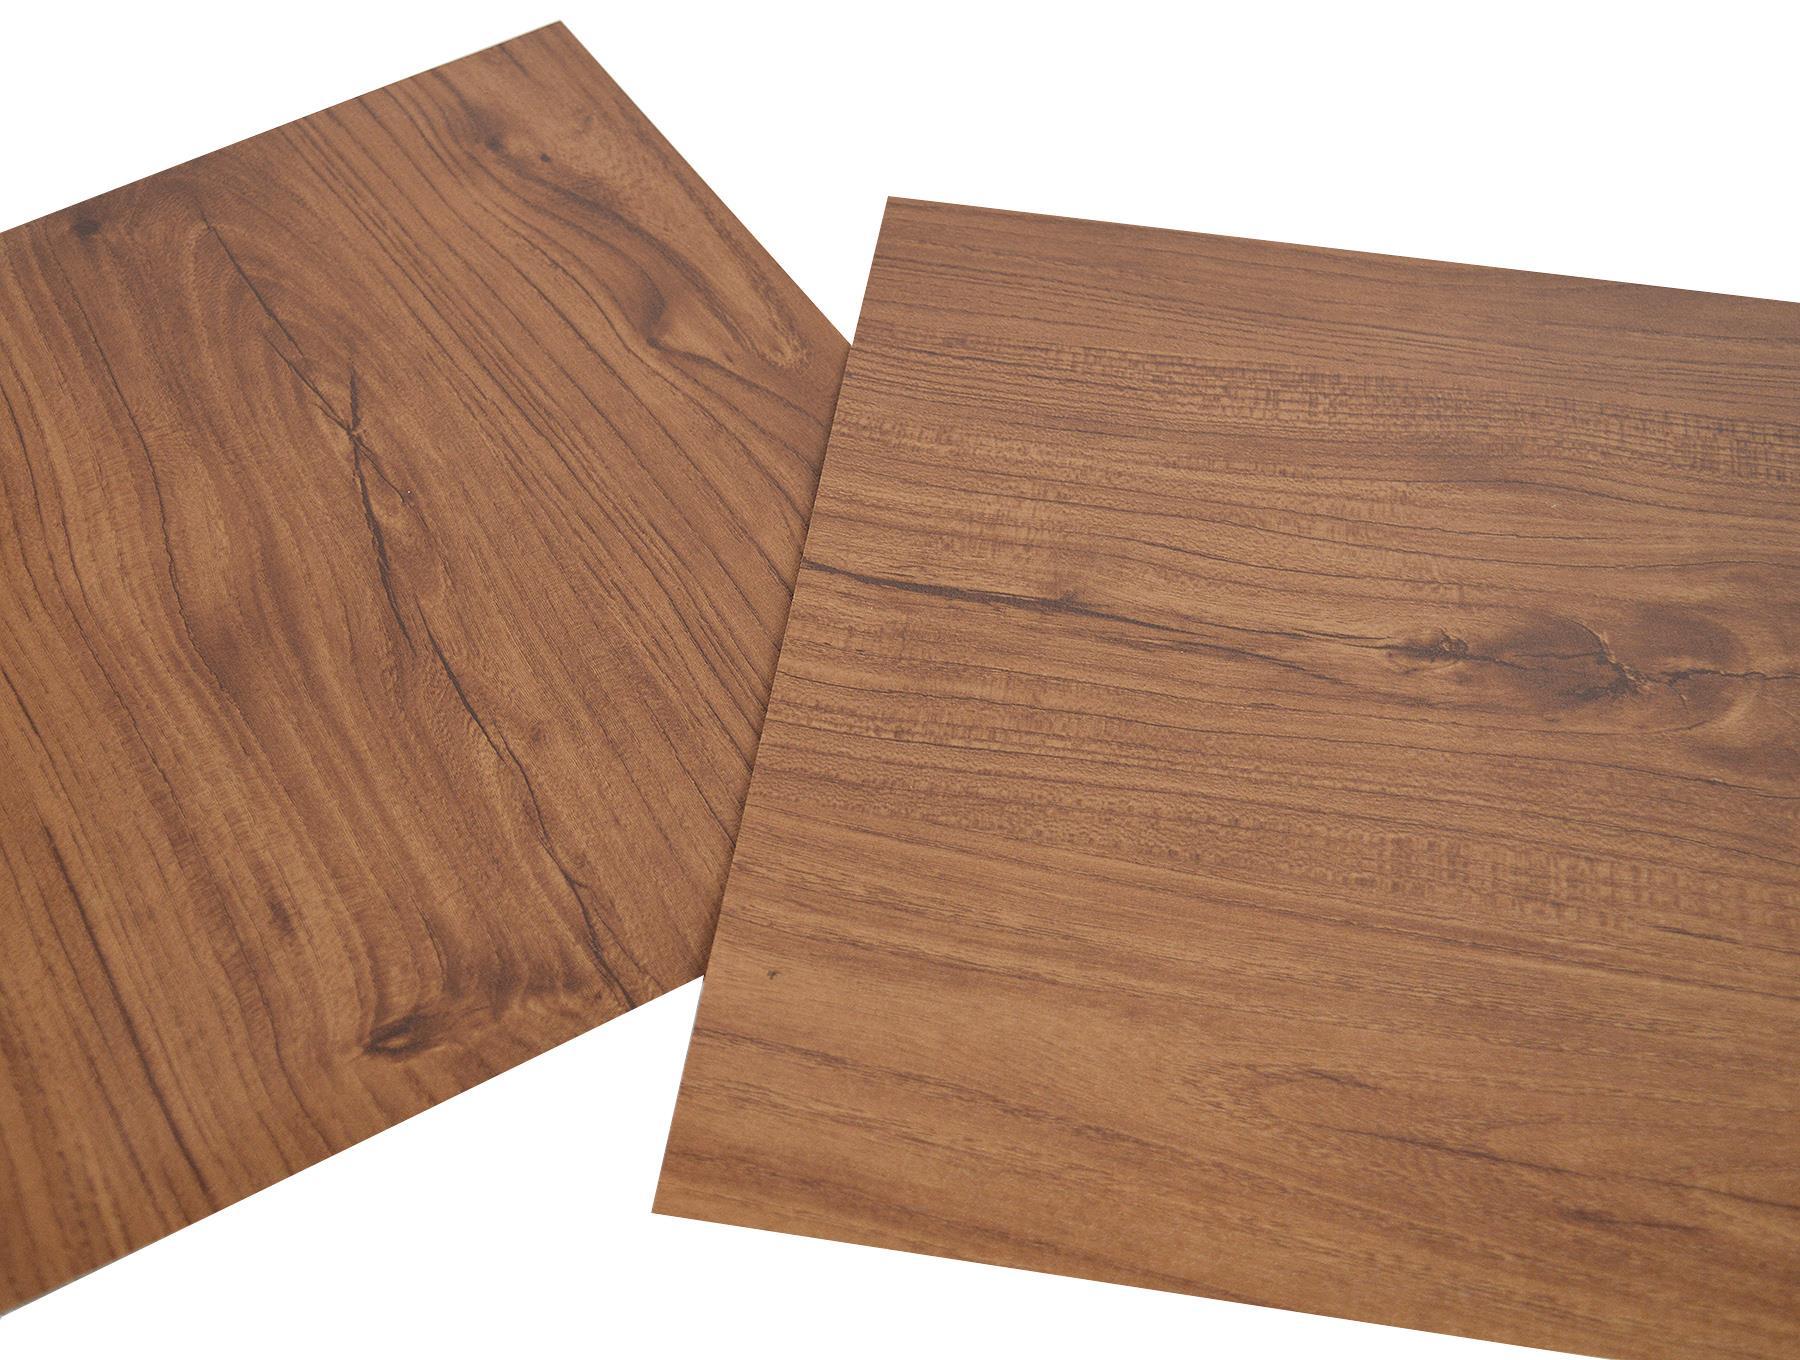 Floor-Tiles-Self-Adhesive-Vinyl-Flooring-Kitchen-Bathroom-Brown-Wood-Grain thumbnail 17